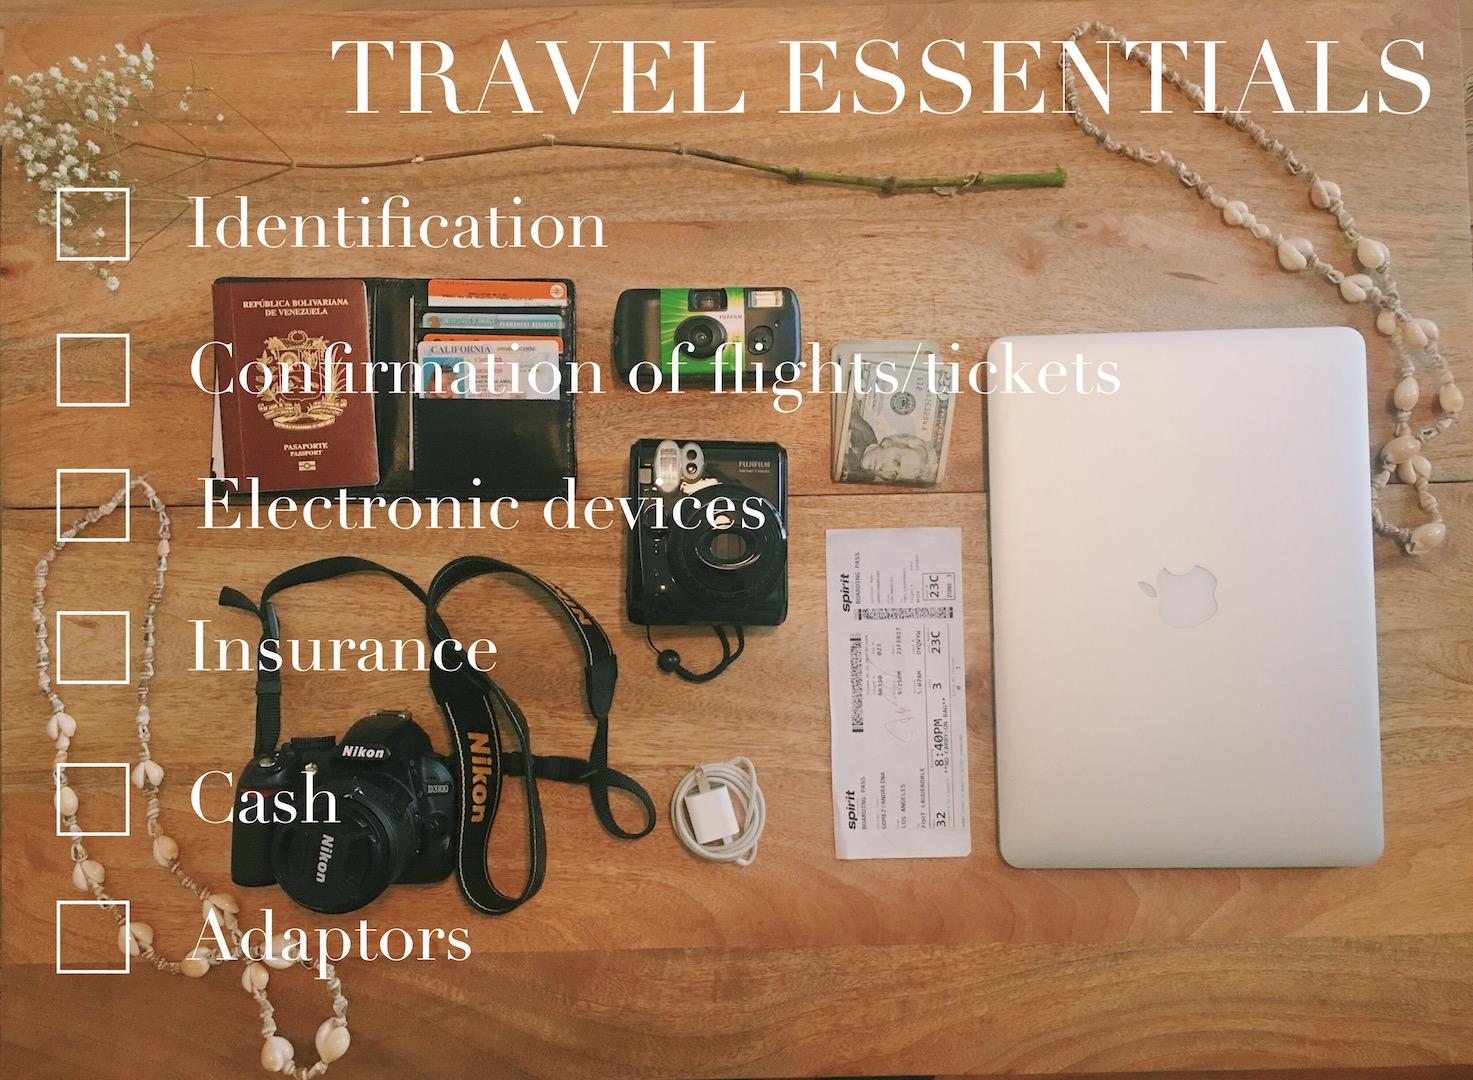 travel-essentials-packing-list